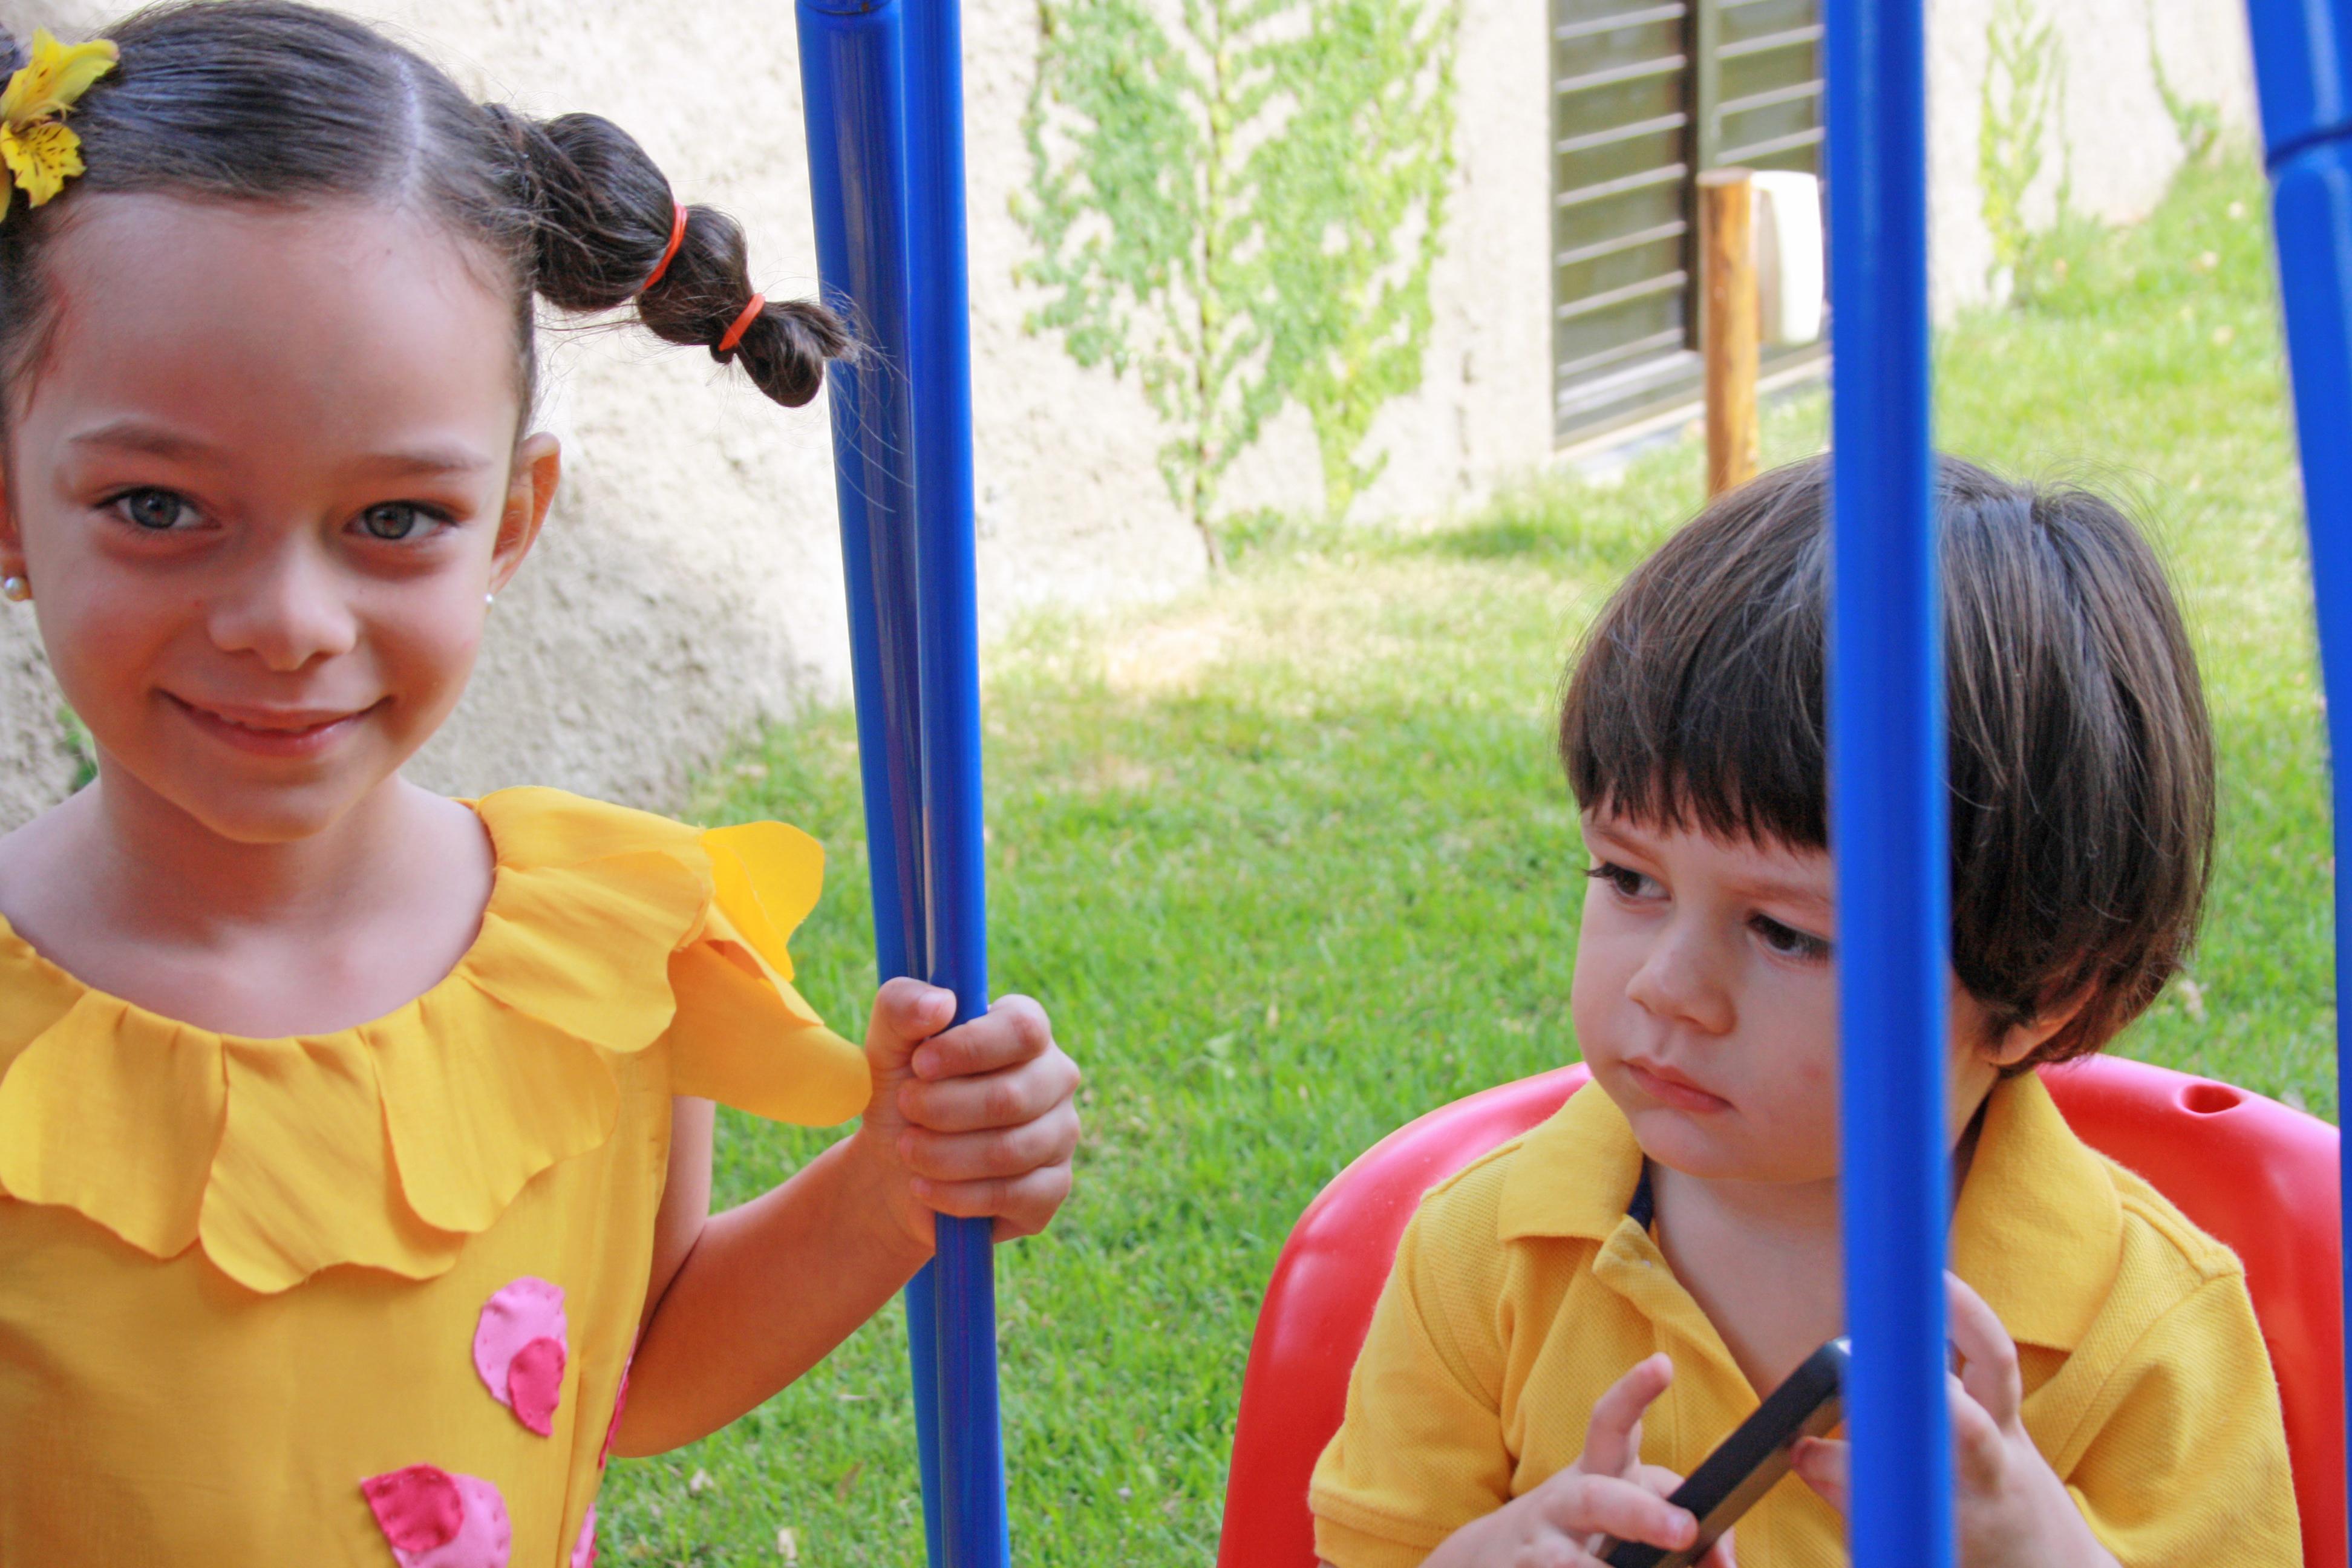 festa jardim da clarilu:Festa de Aniversário: Jardim da Clarilú! – Corujices